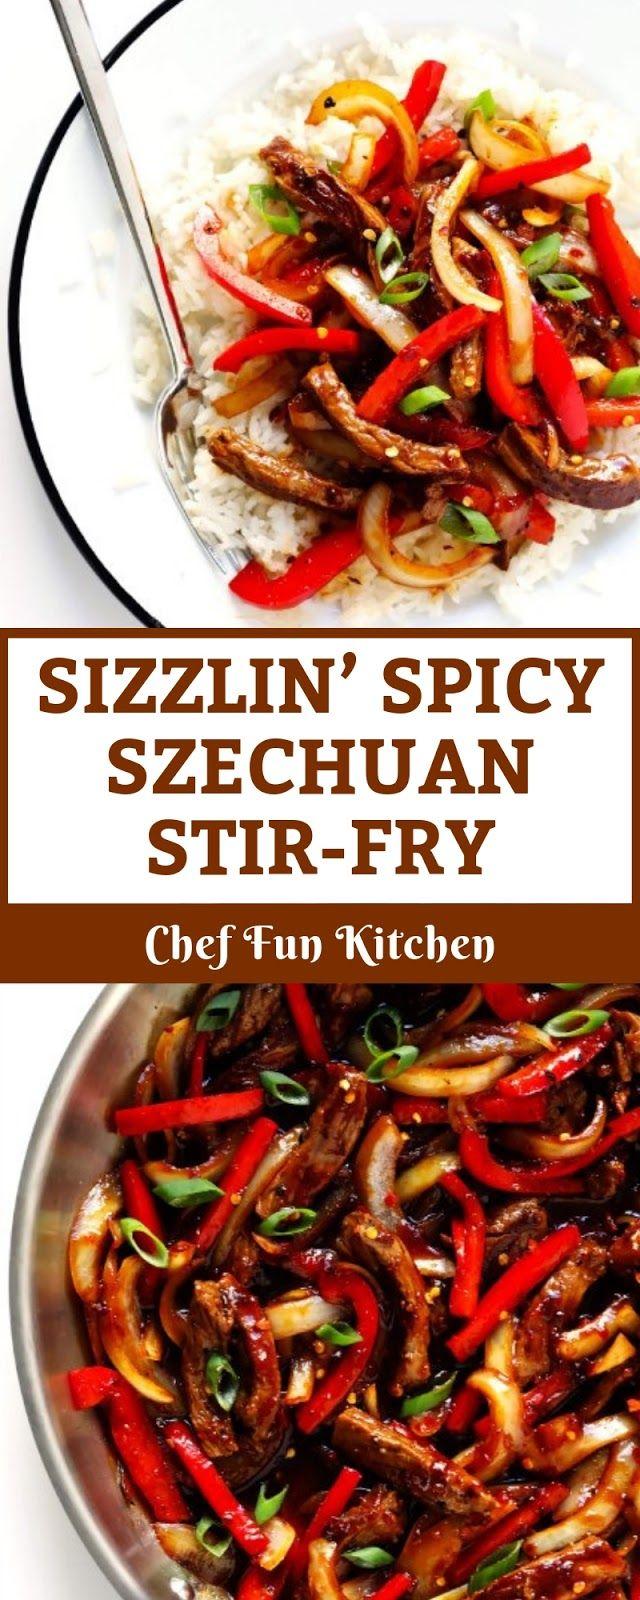 SIZZLIN' SPICY SZECHUAN STIR-FRY #healthystirfry